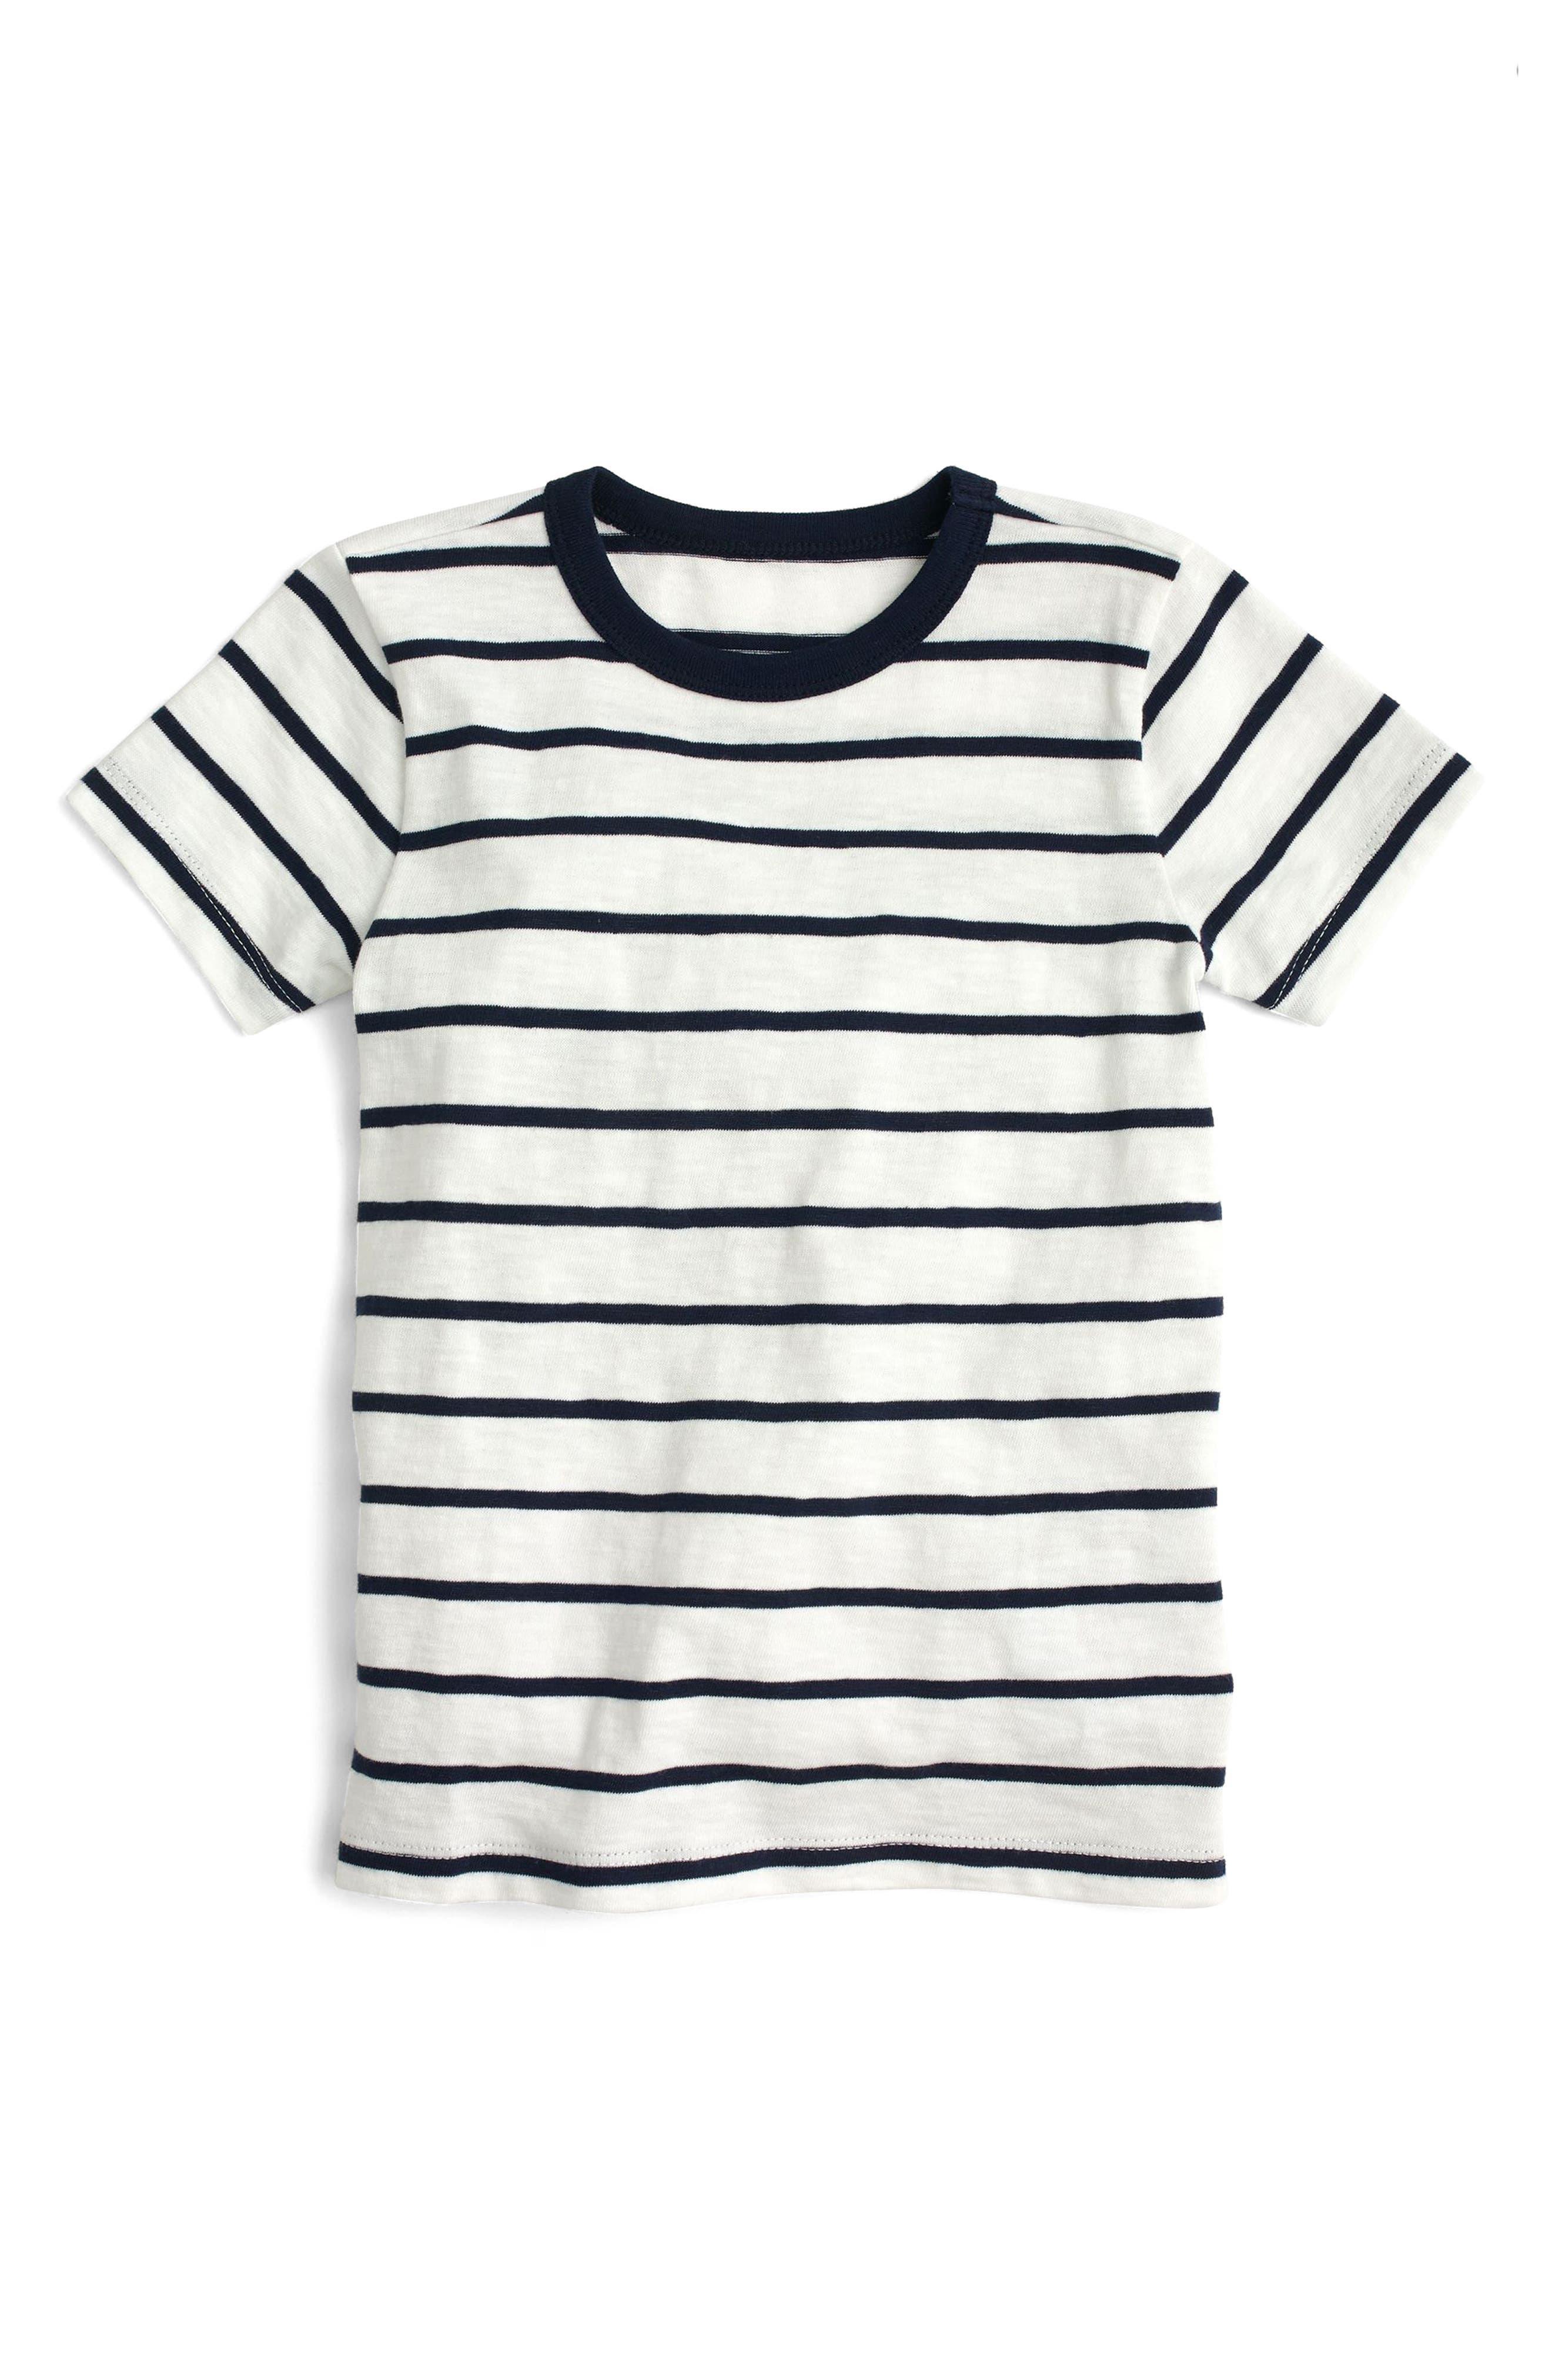 crewcuts by J.Crew Denali Stripe Slub T-Shirt (Toddler Boys, Little Boys & Big Boys)